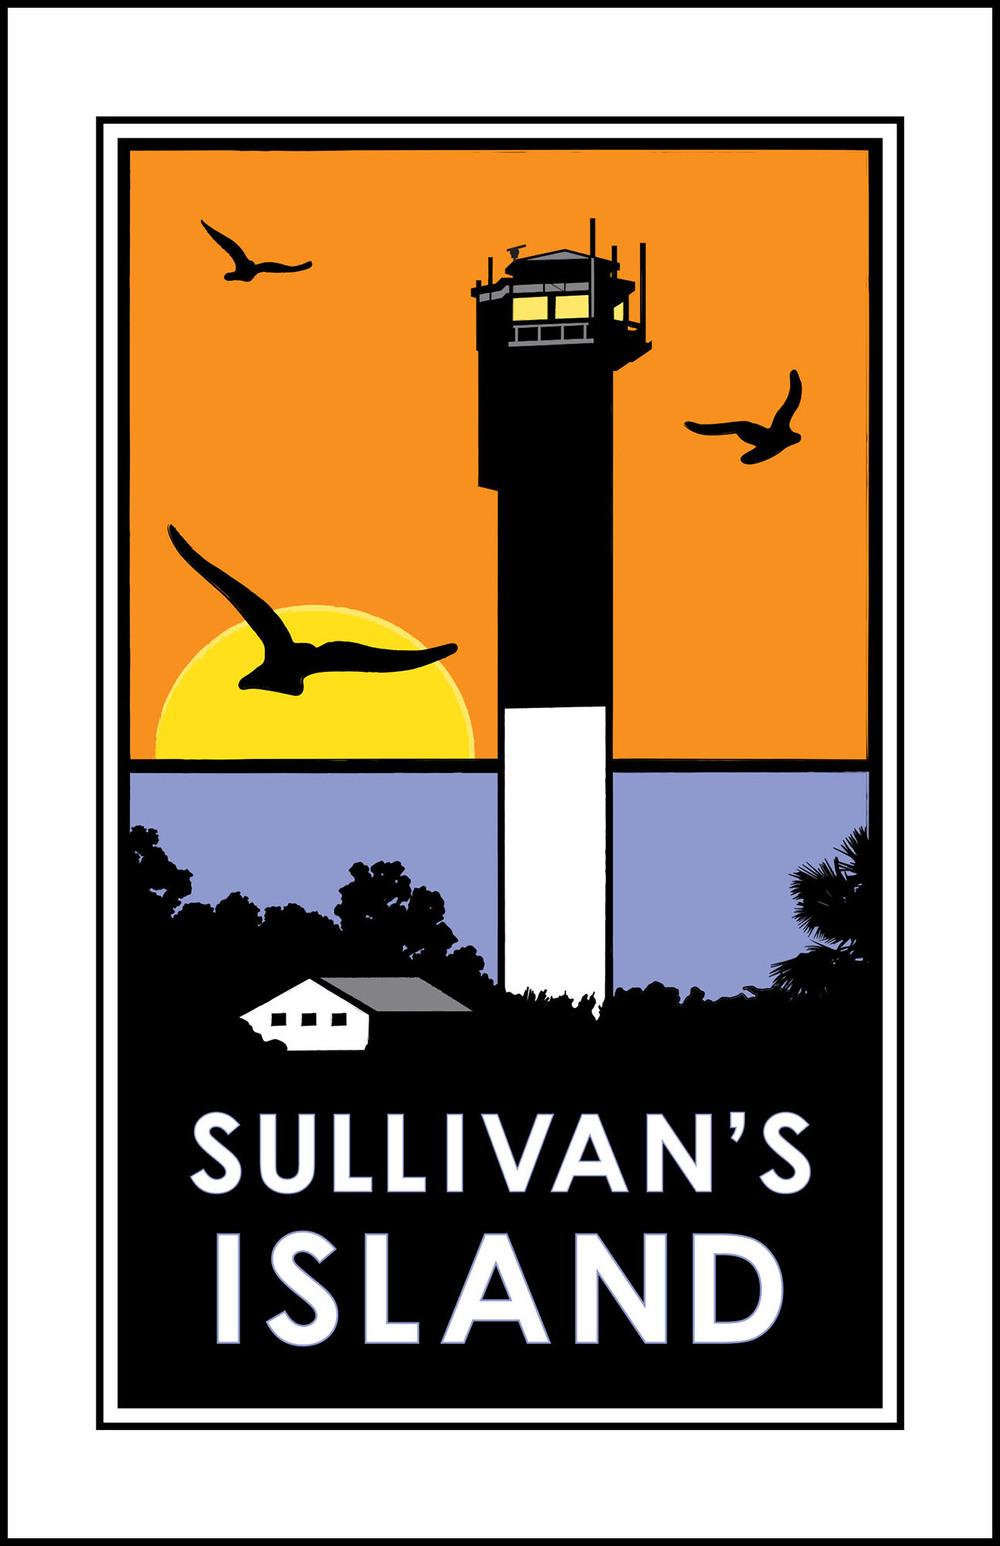 Sullivans Island_11 x 17.jpg